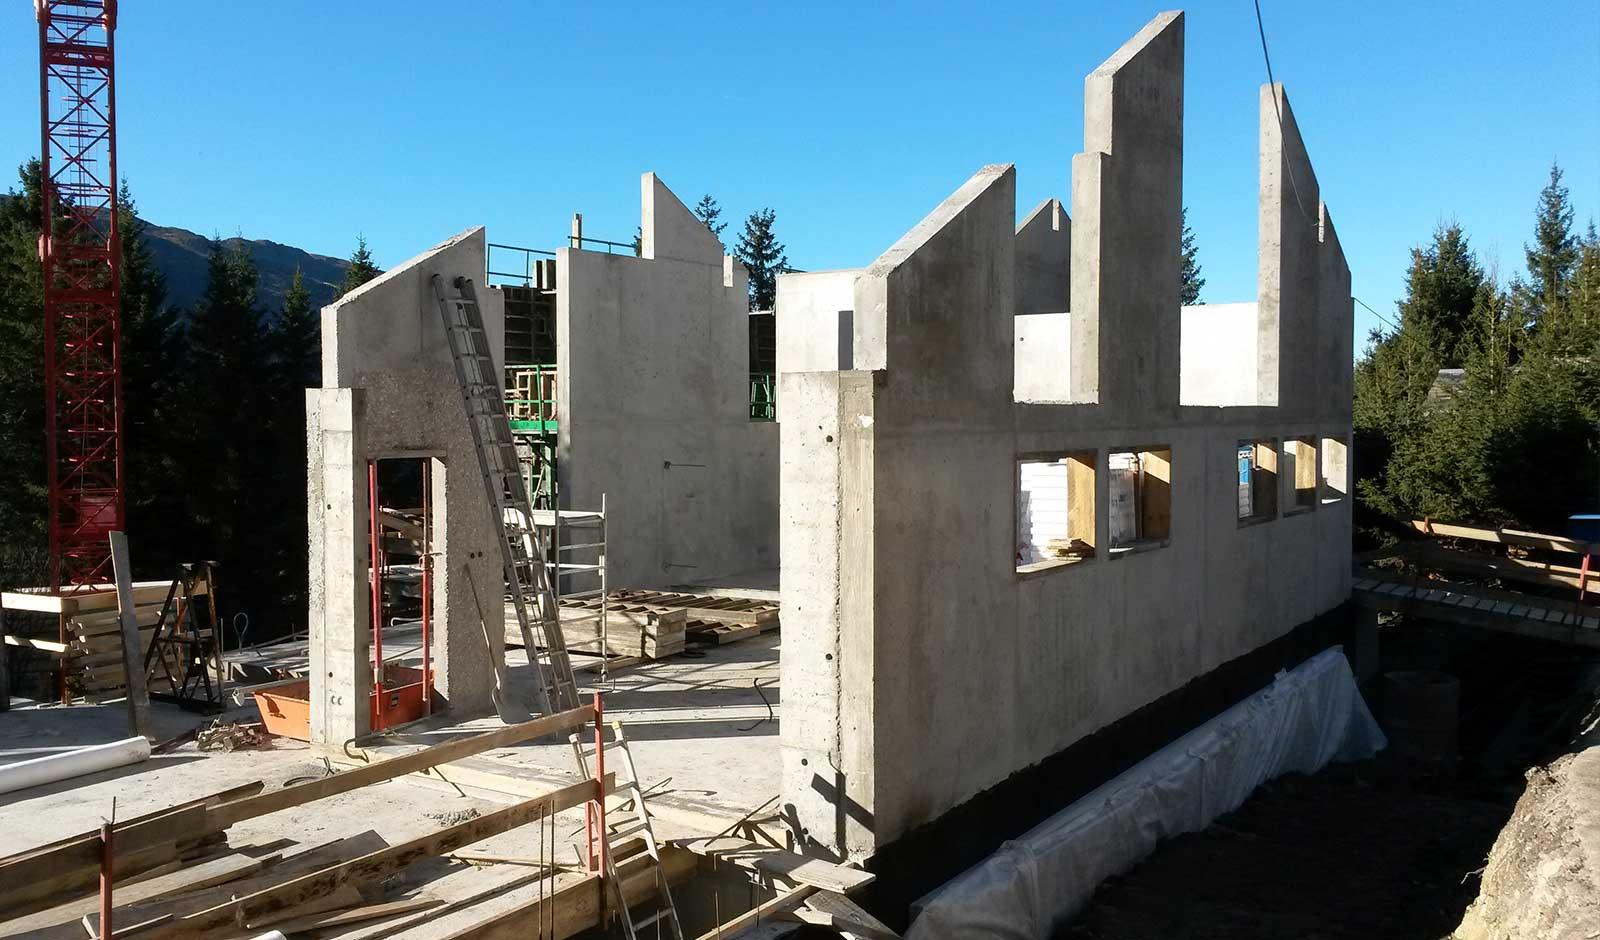 chalet-alpaca-4-atelier-crea-and-co-architecte-design-project-manager-meribel-savoie